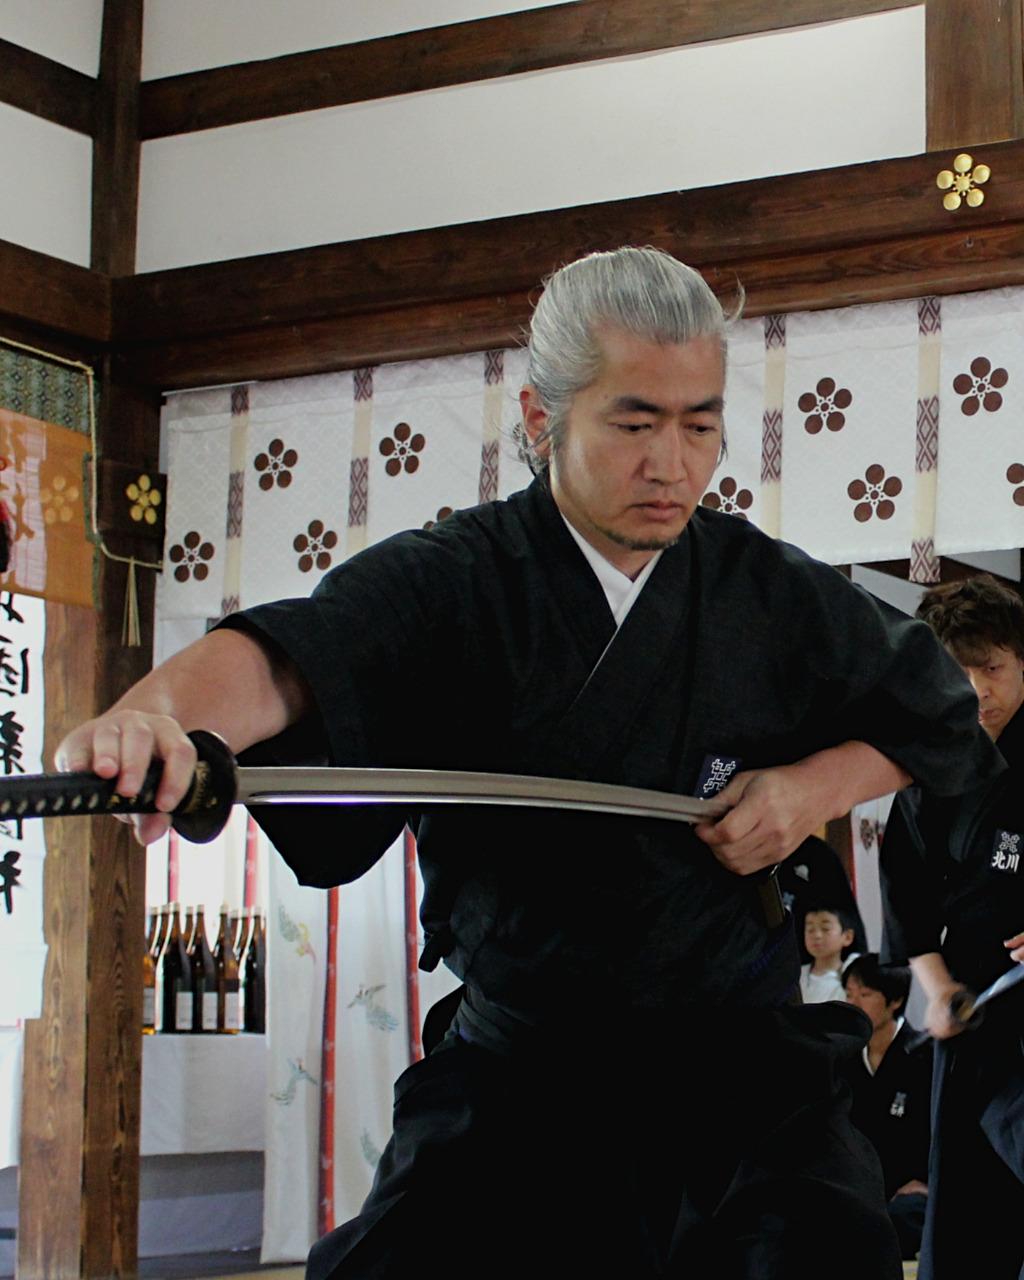 Iaido, sword drawing, at Oyama Shrine in Kanazawa, Japan